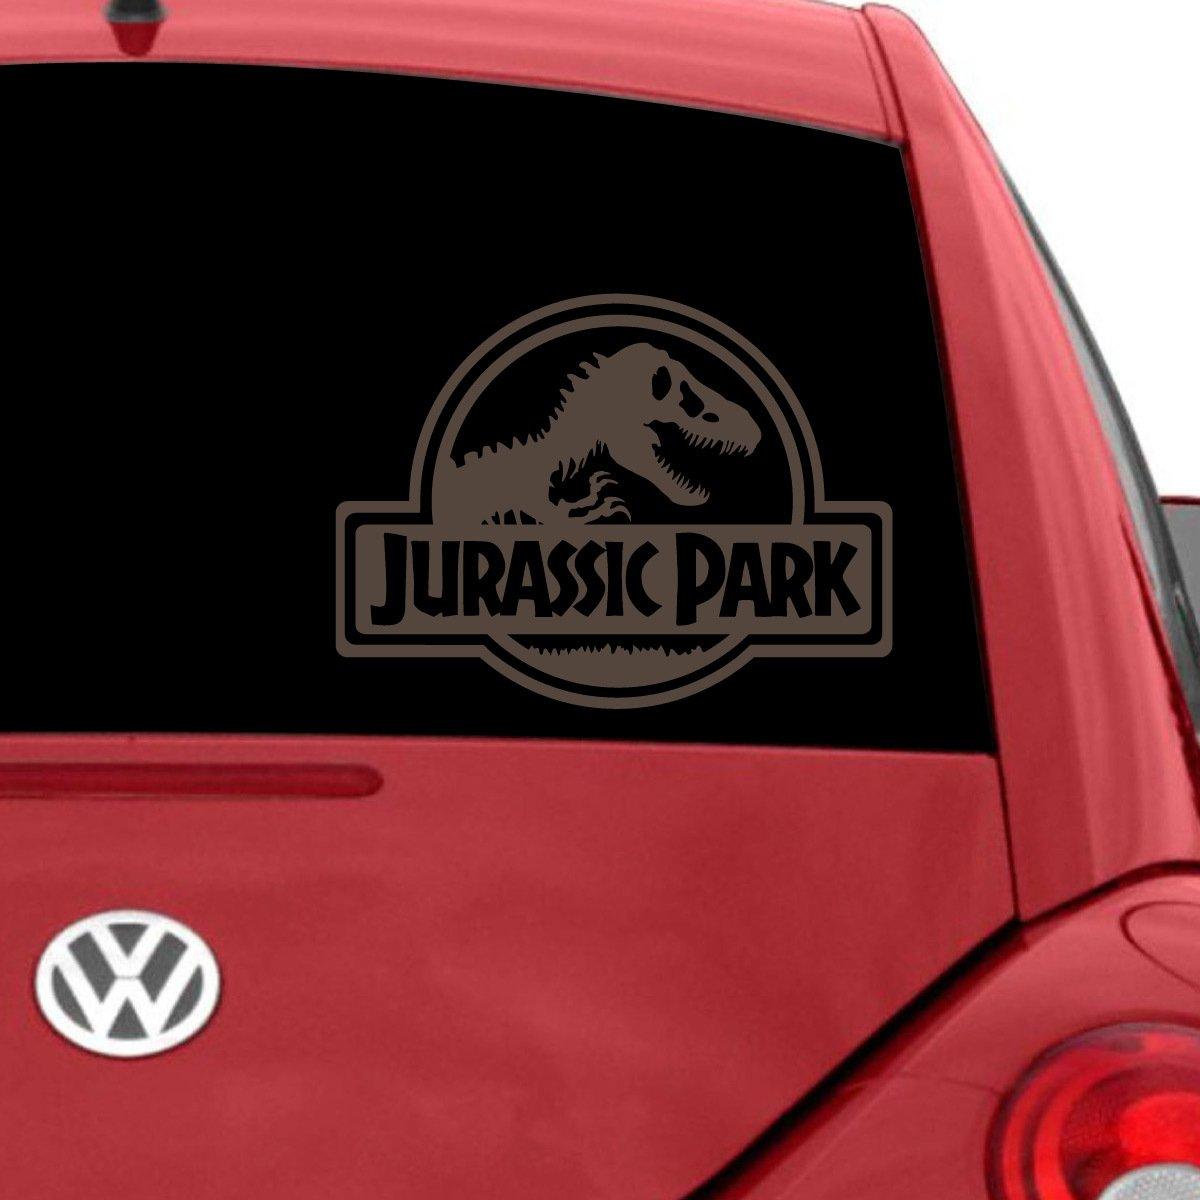 a66ee90b0a Amazon.com  Jurassic Park Car Decal